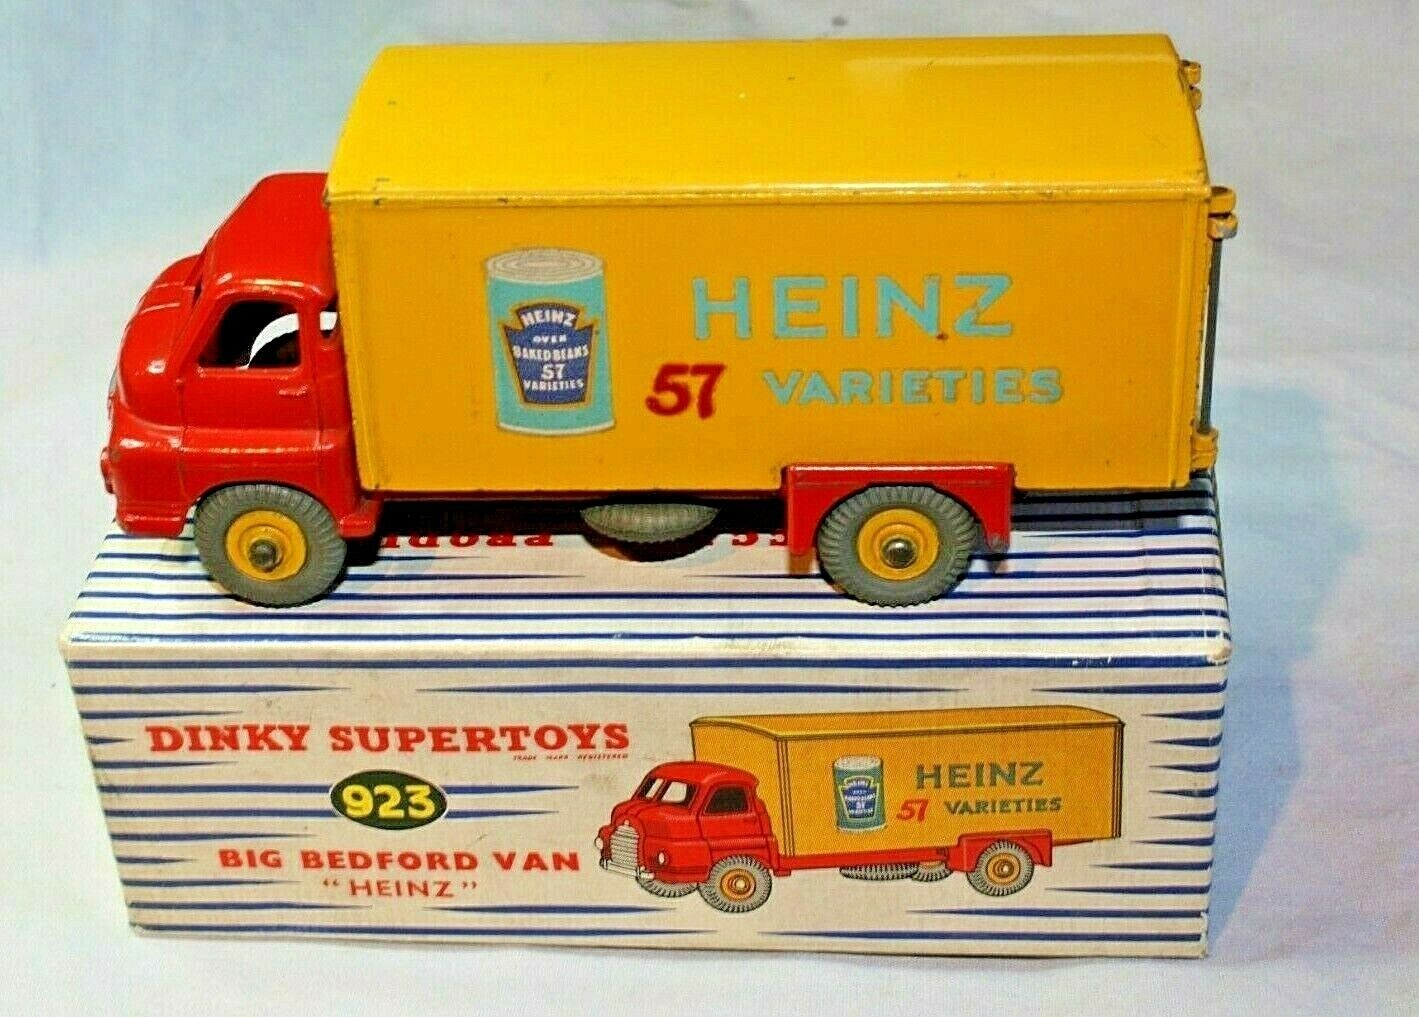 Dinky 923 BIG BEDFORD VAN (Heinz), excellent état en bonne boîte d'origine